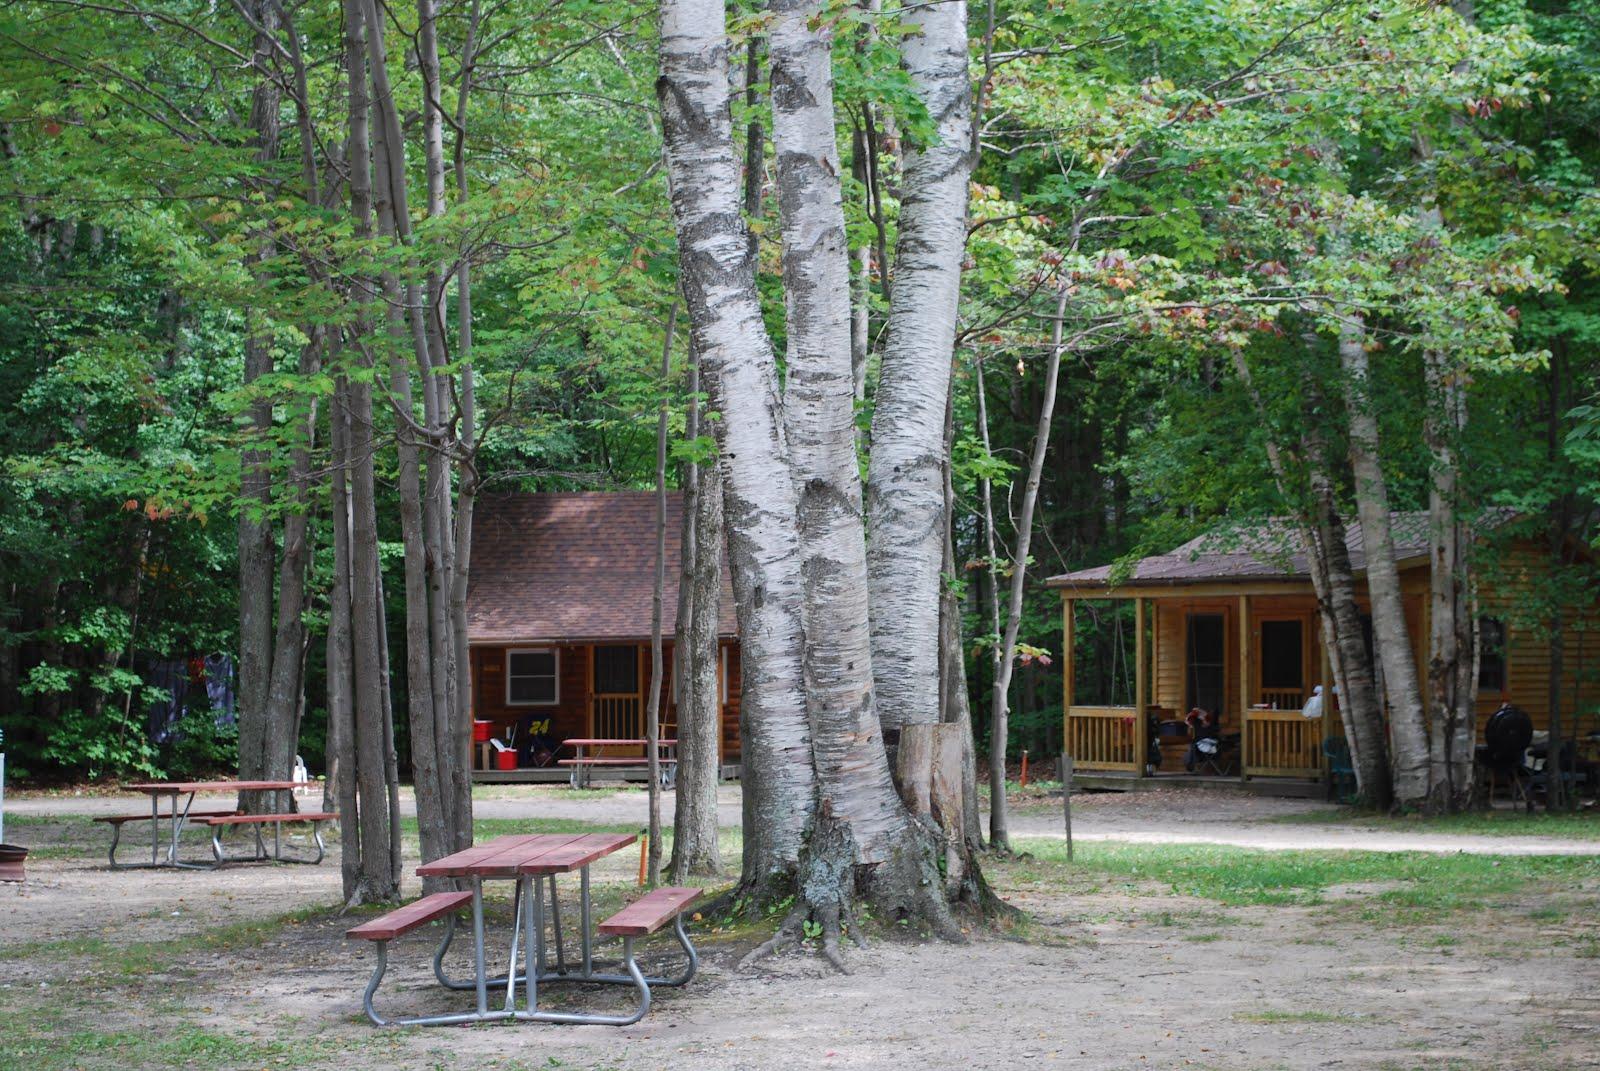 mackinac campgrounds site cabins koa city type island mackinaw lodging michigan